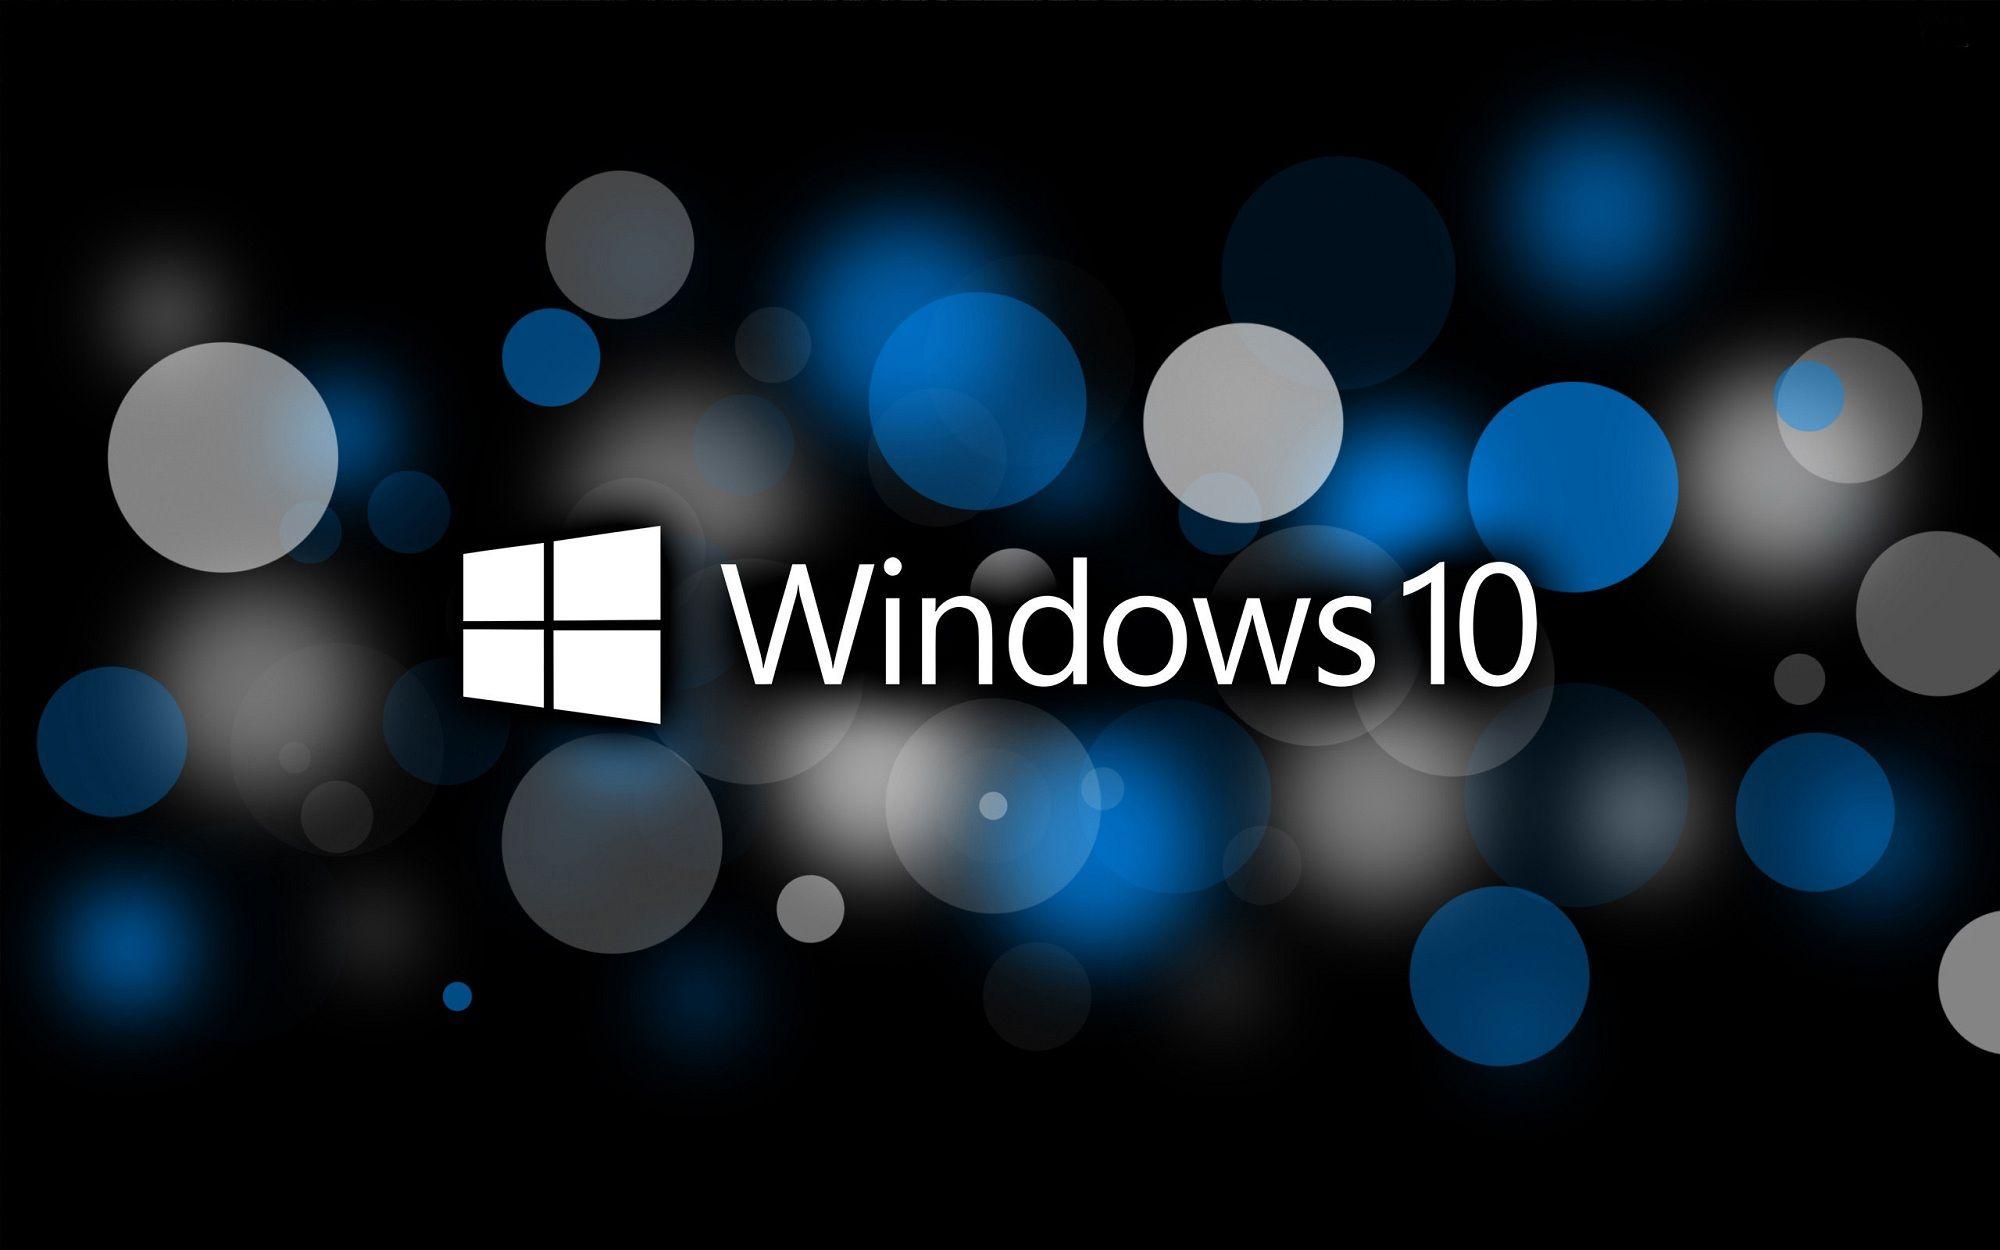 Wallpaper Gone After Windows 10 Update